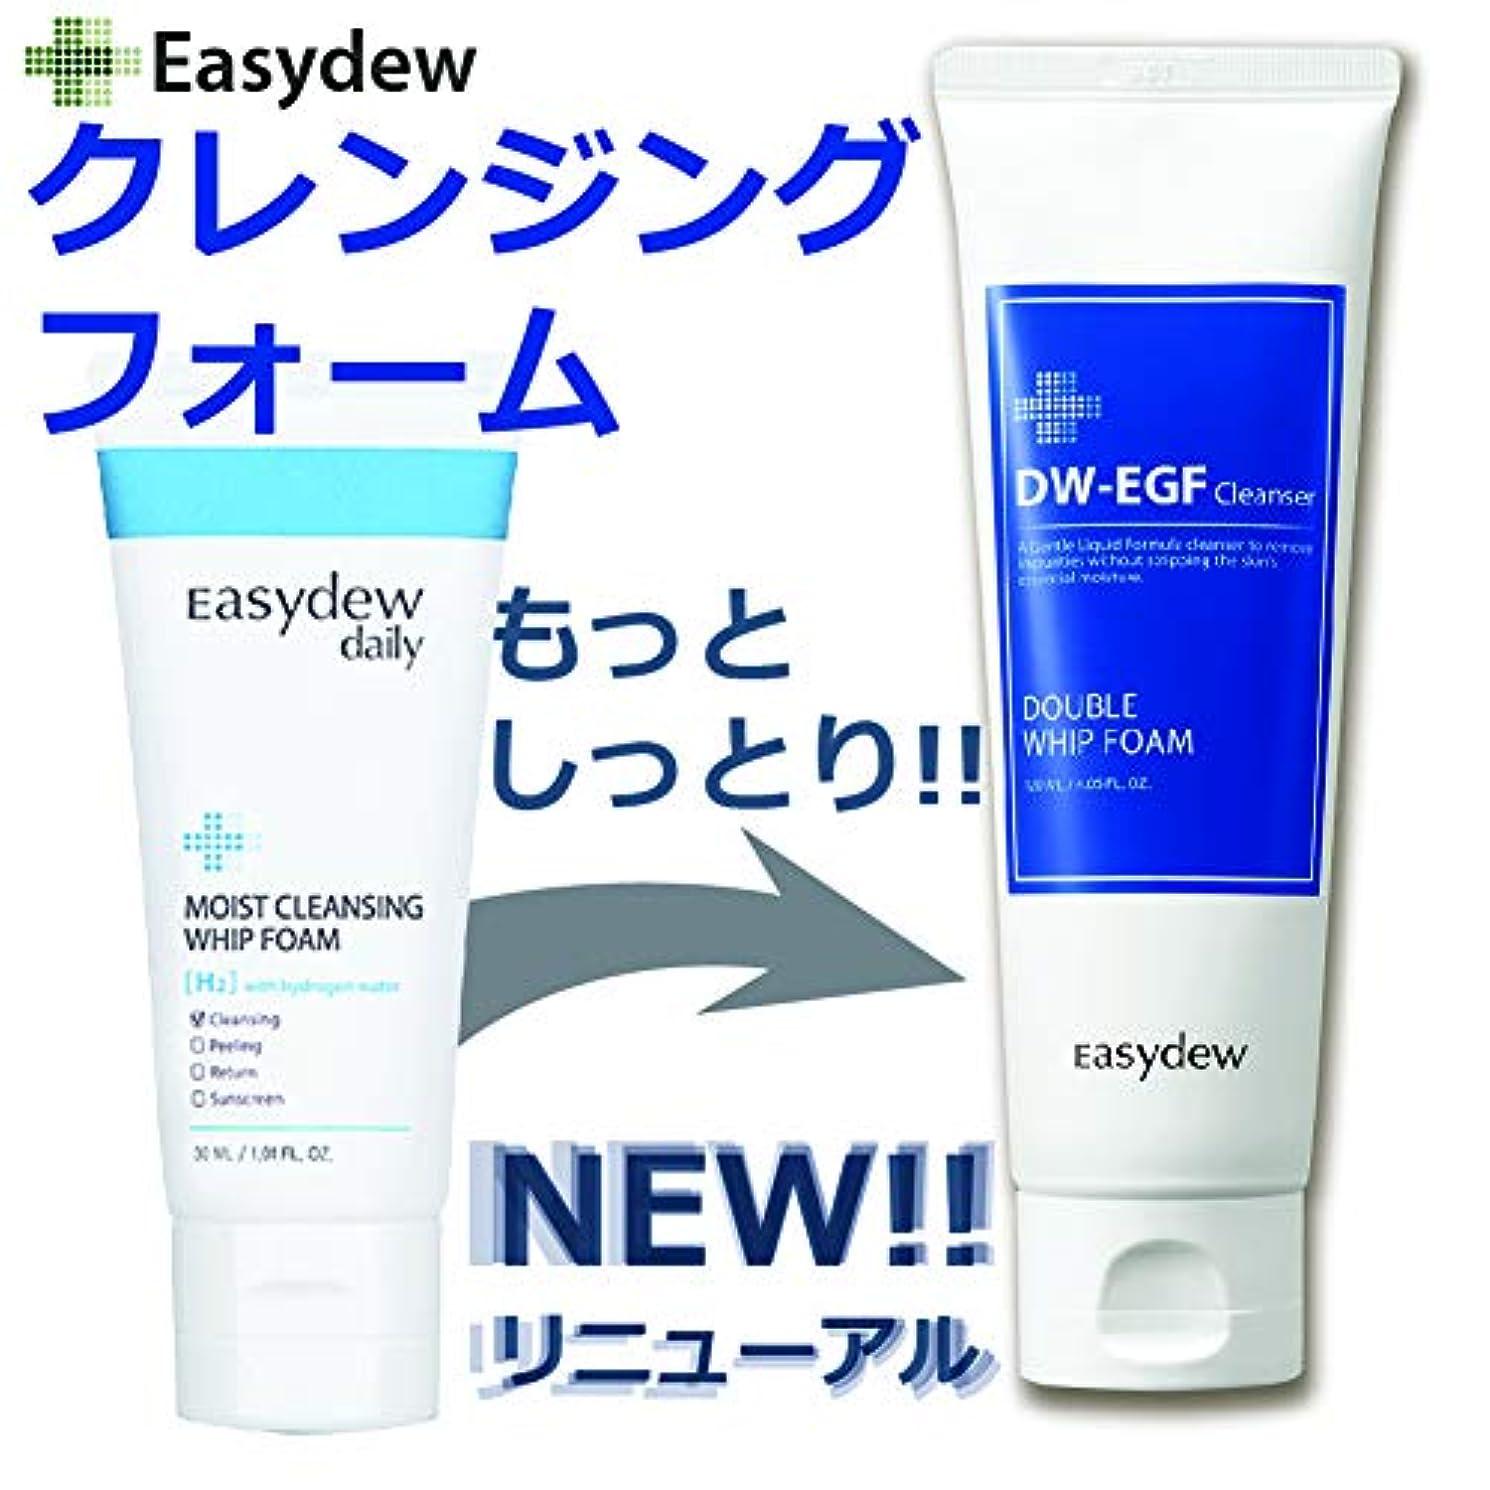 EASYDEW DW-EGF ダブル ホイップ フォーム 120ml EASYDEW DW Double Cleansing Whip Foam120ml